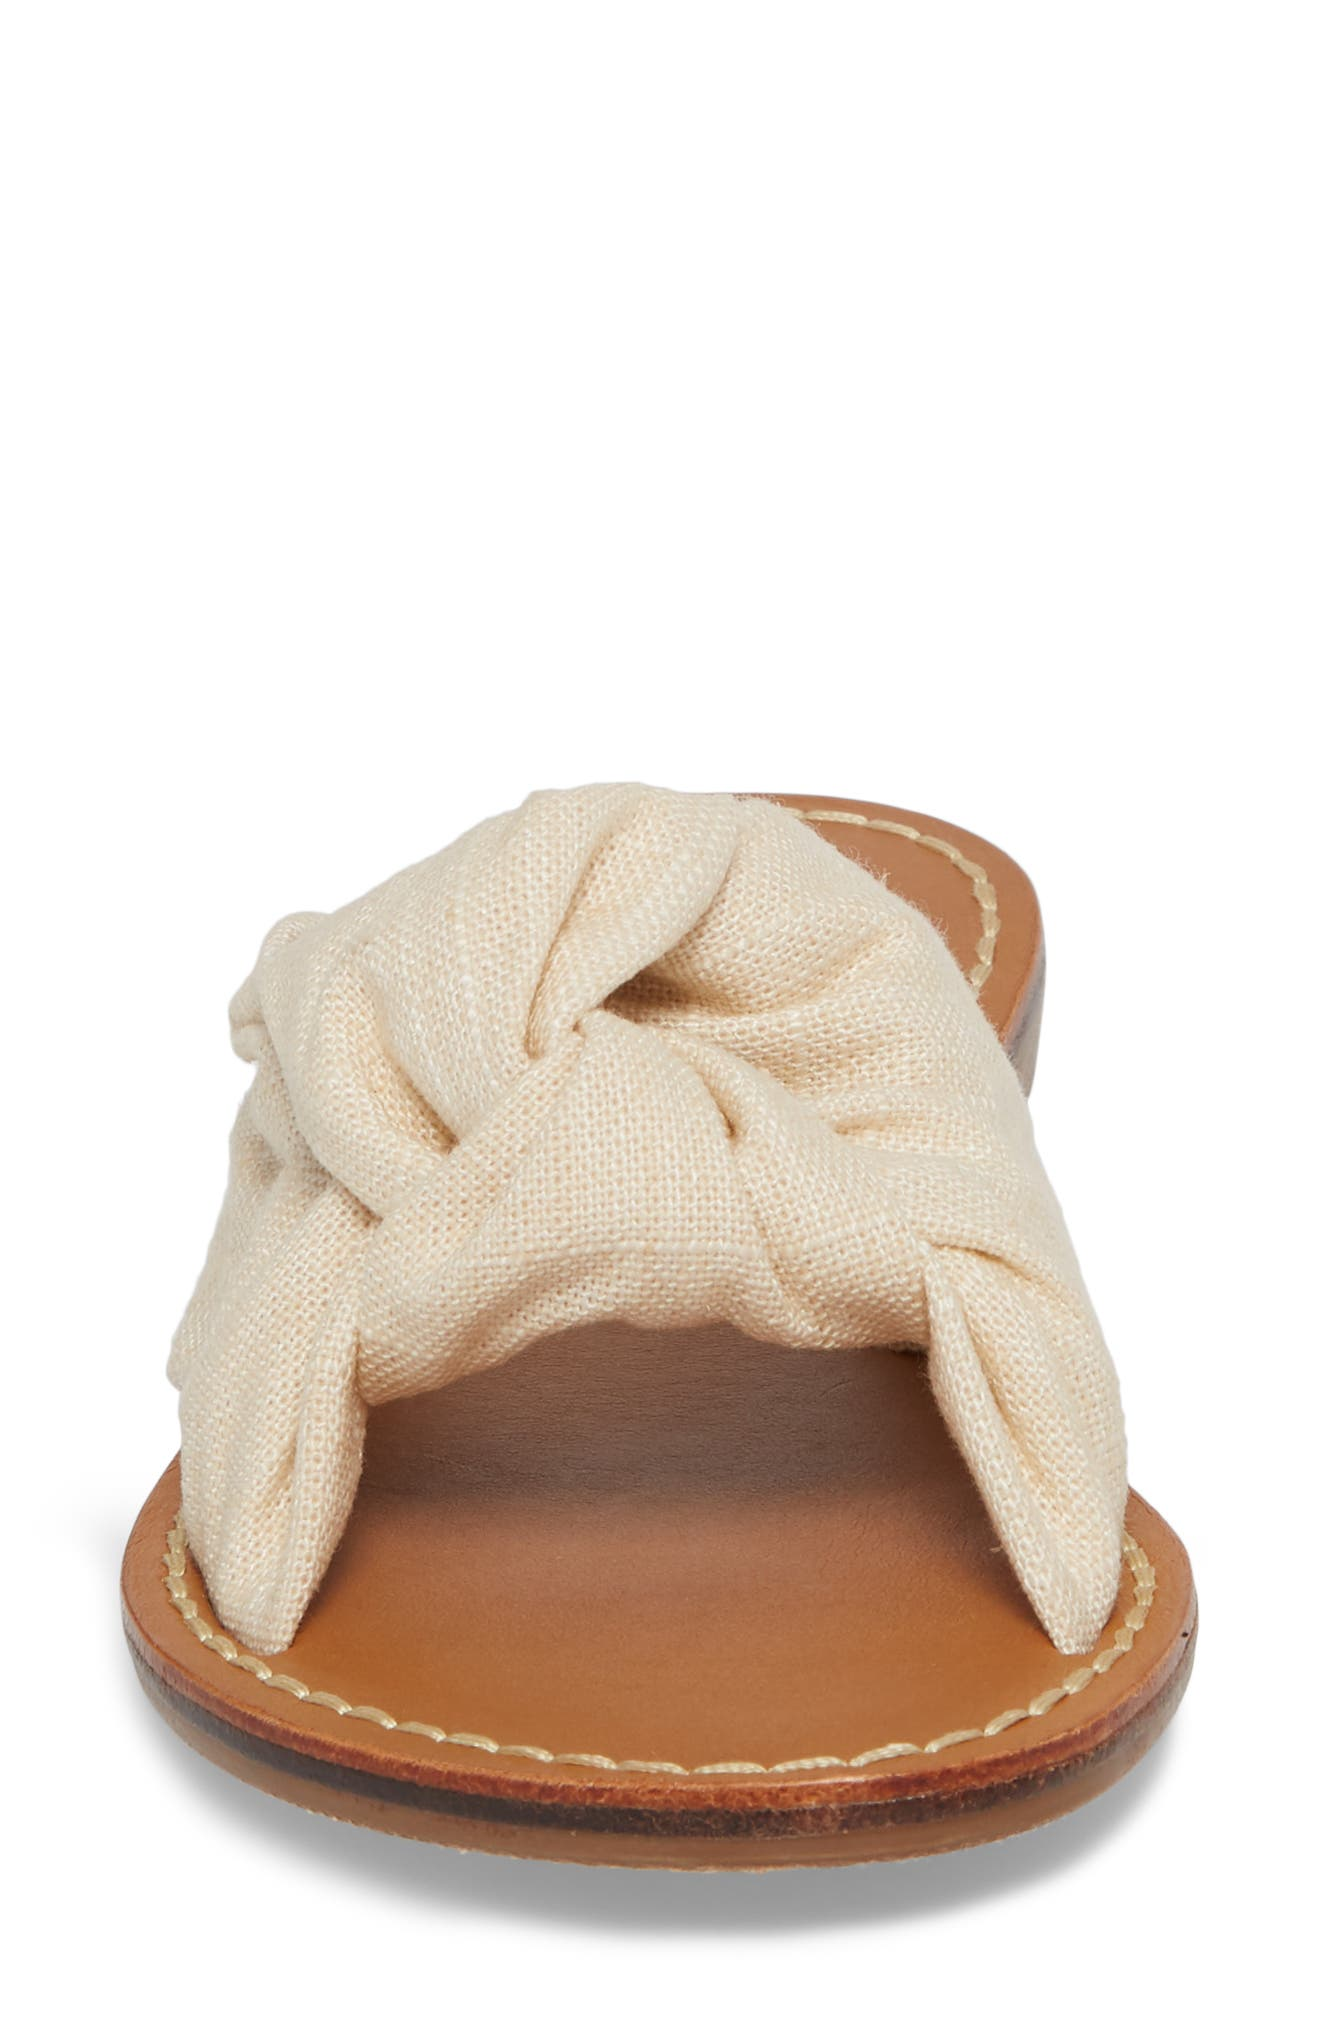 Knotted Slide Sandal,                             Alternate thumbnail 4, color,                             Blush Fabric